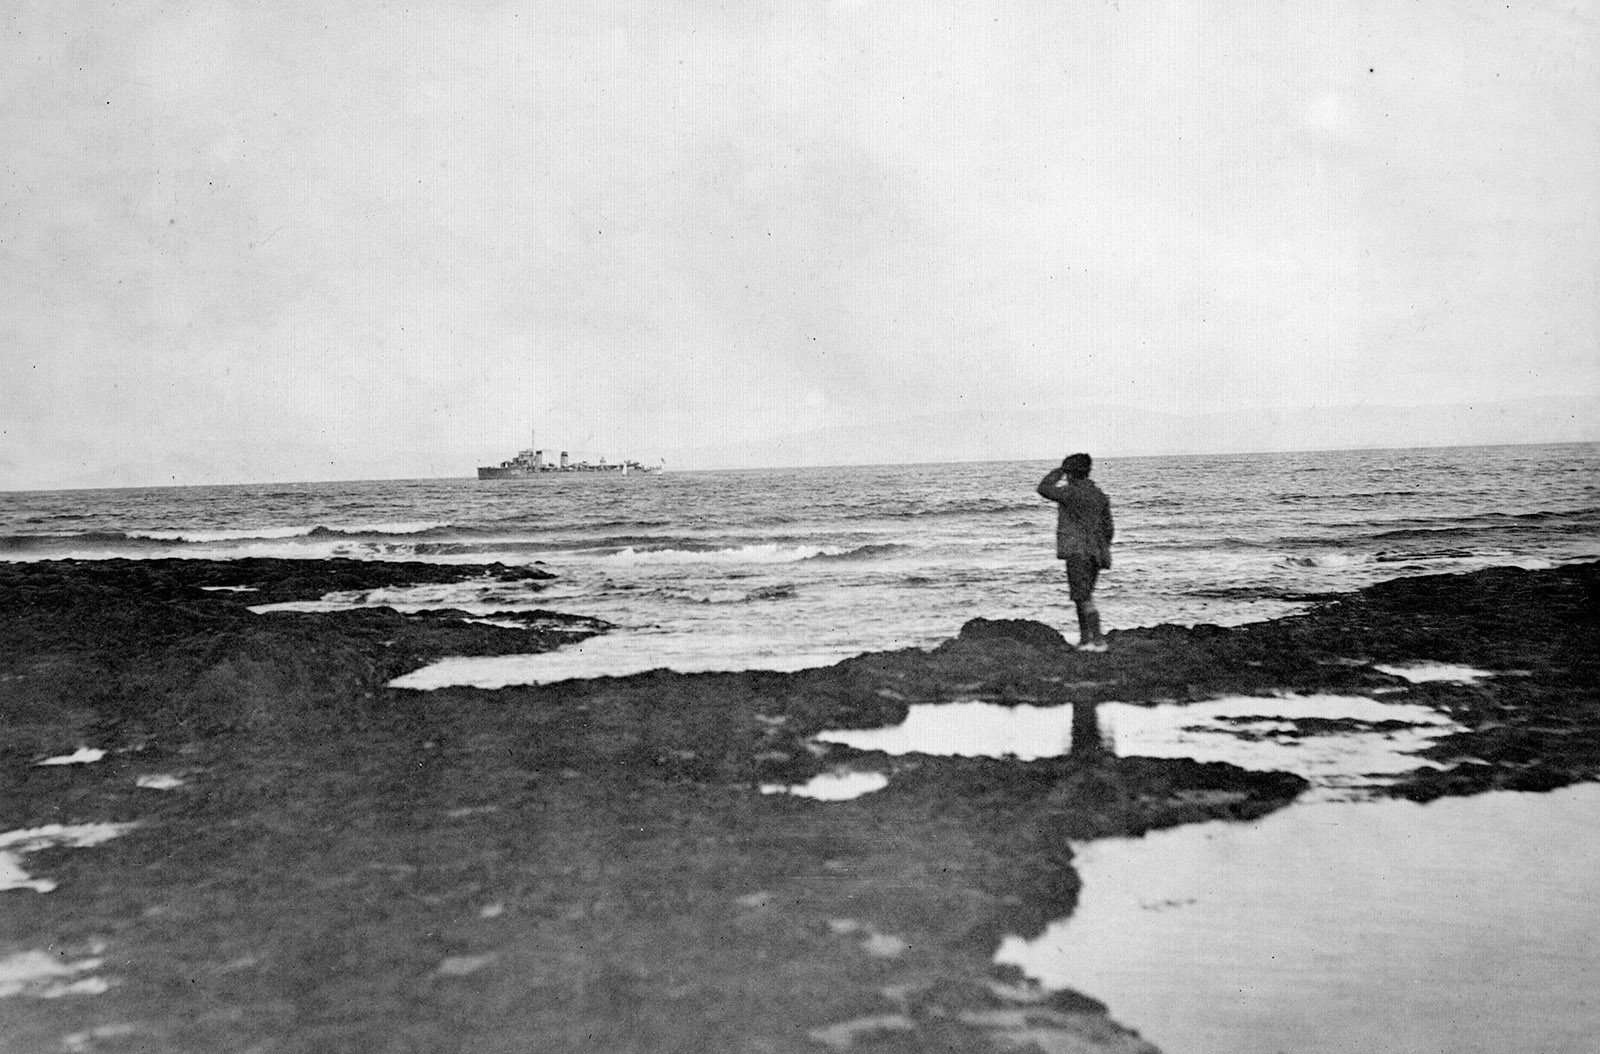 British warships arriving at Donegal Bay during the Irish Civil War